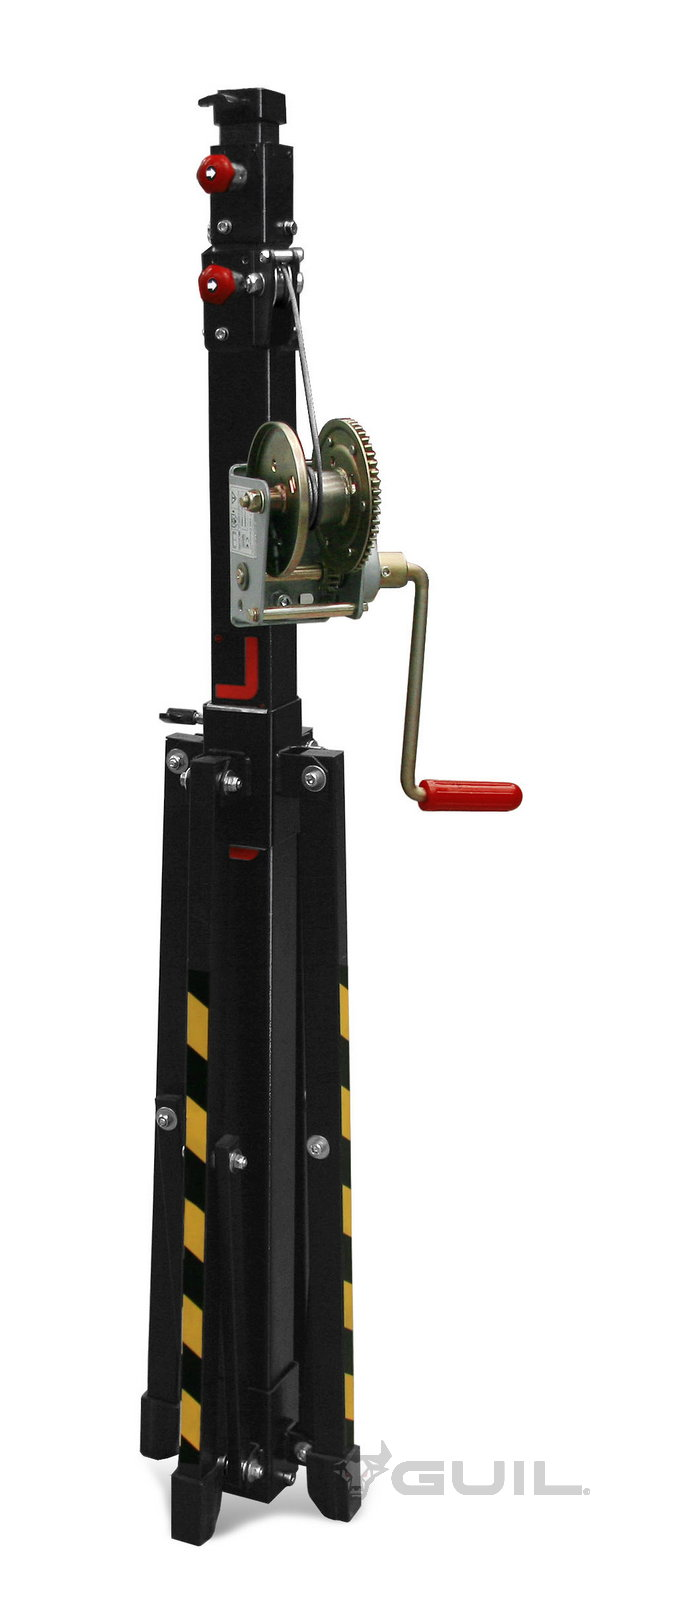 Materiaallift 1,4-3,5 m 125 kg (dutch) (2)